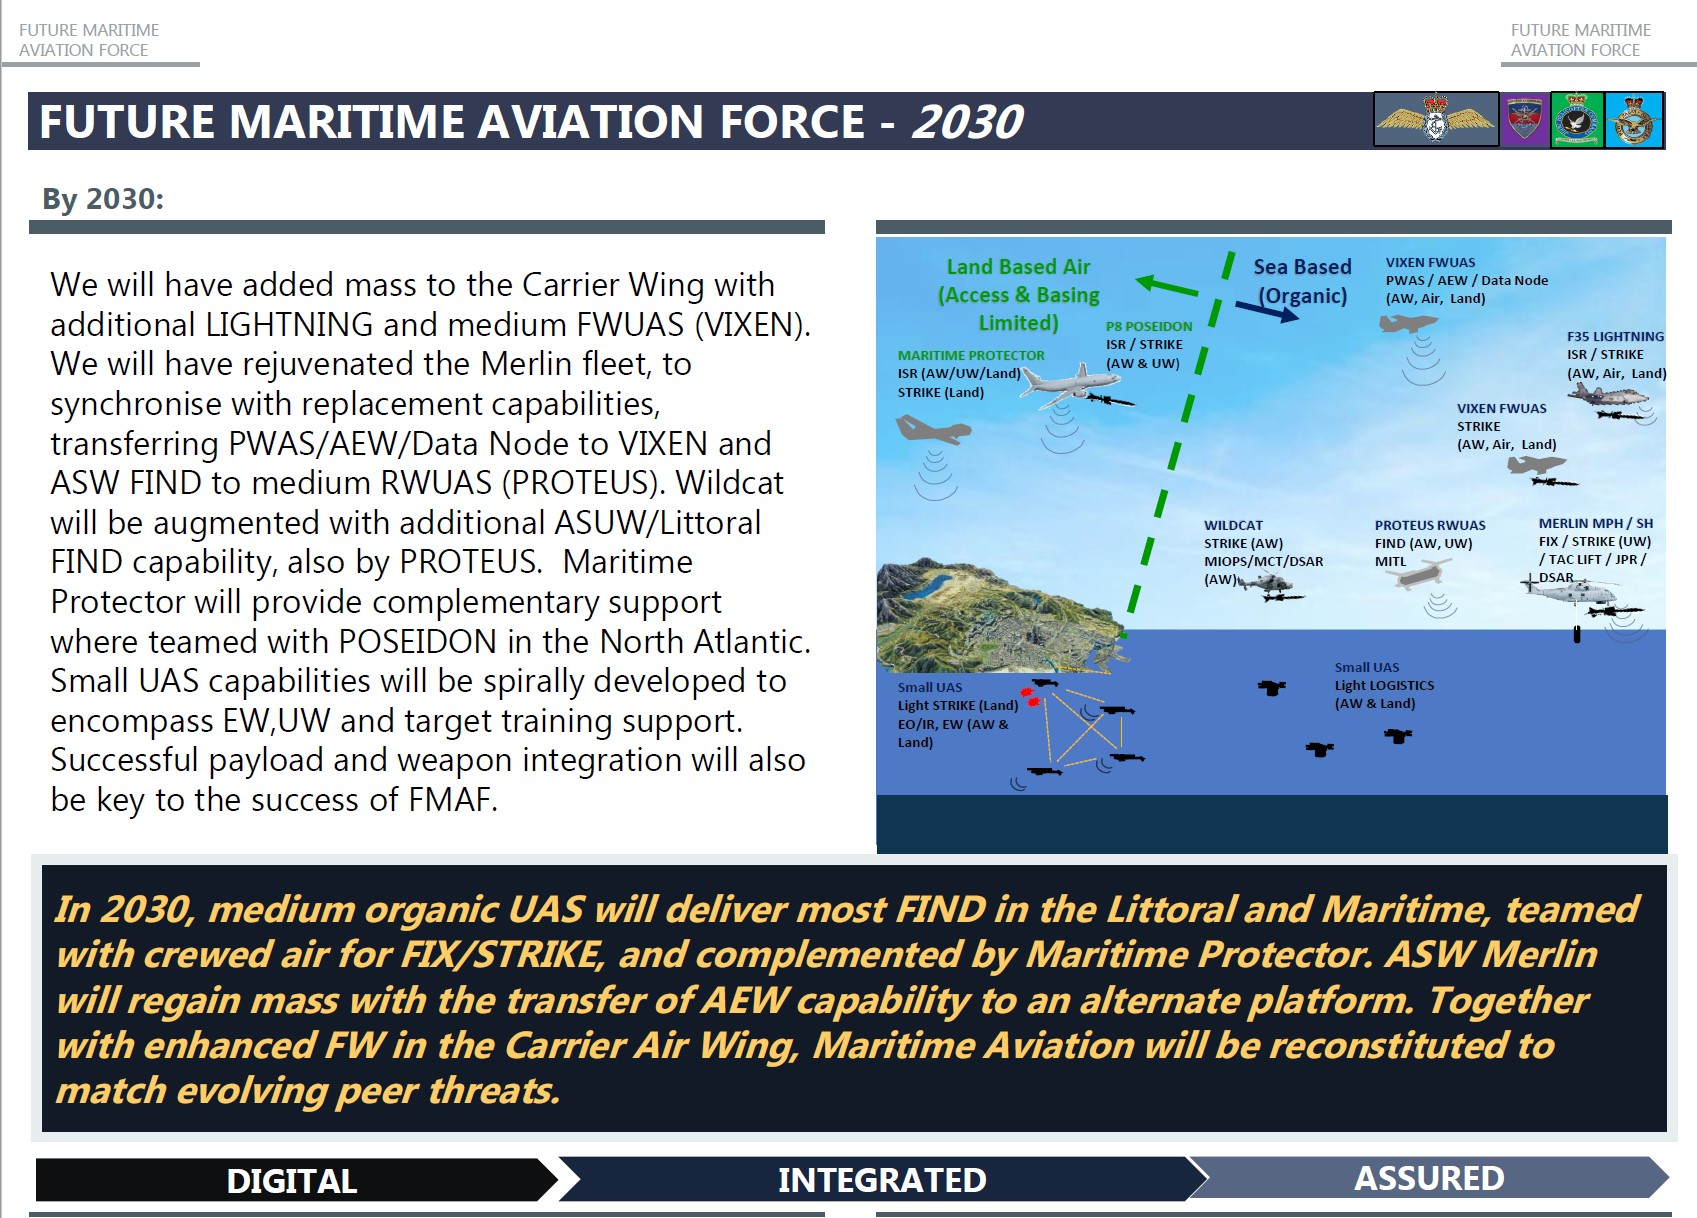 Future Maritime Aviation Force - 2030.jpg